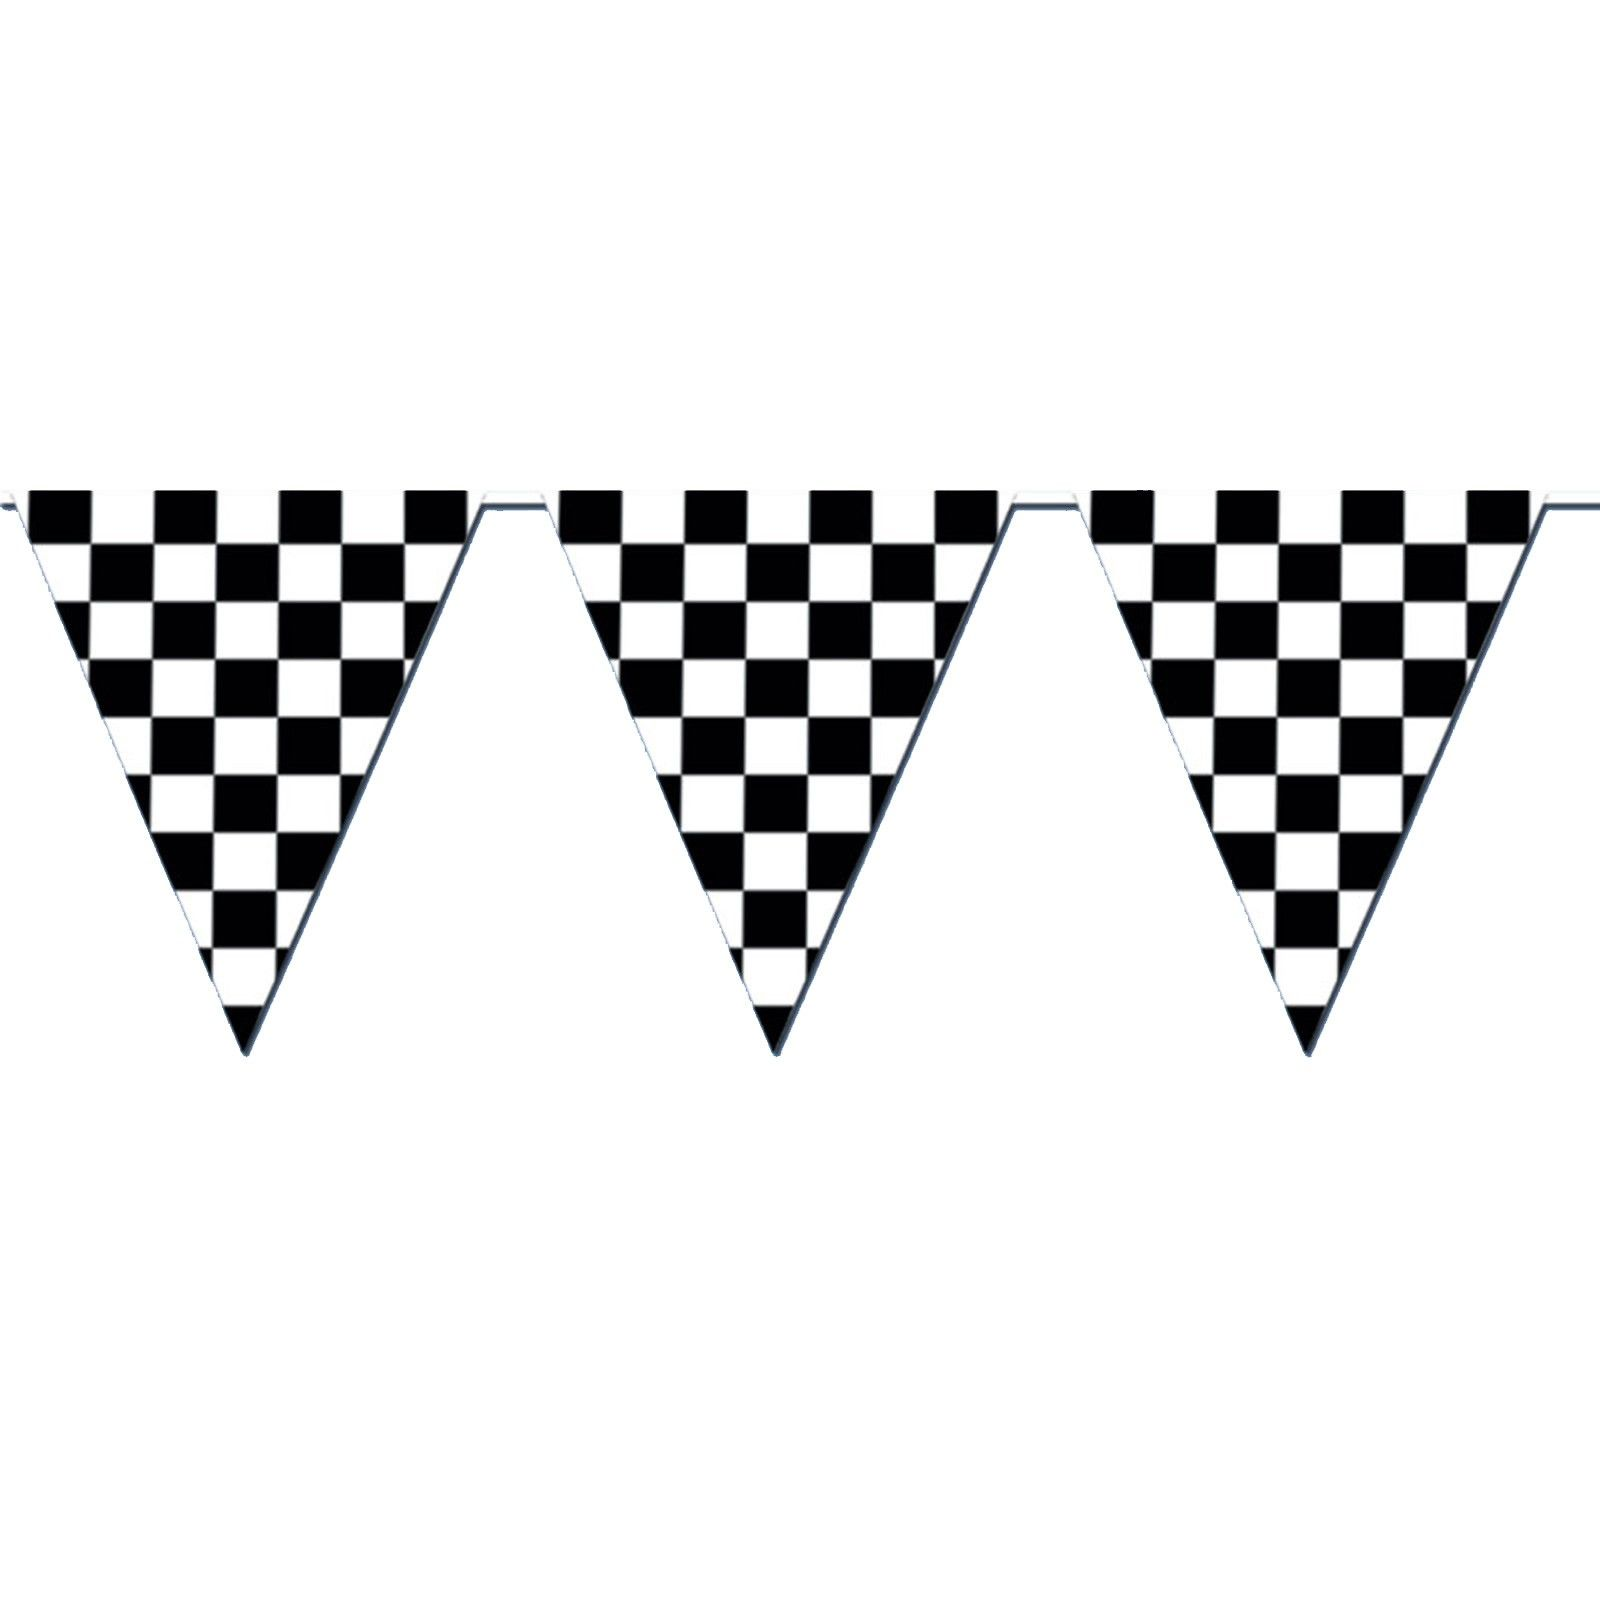 120 Checkered Outdoor Pennant Banner Banderines De Carreras Carreras De Autos Cumpleanos De Coches De Carreras